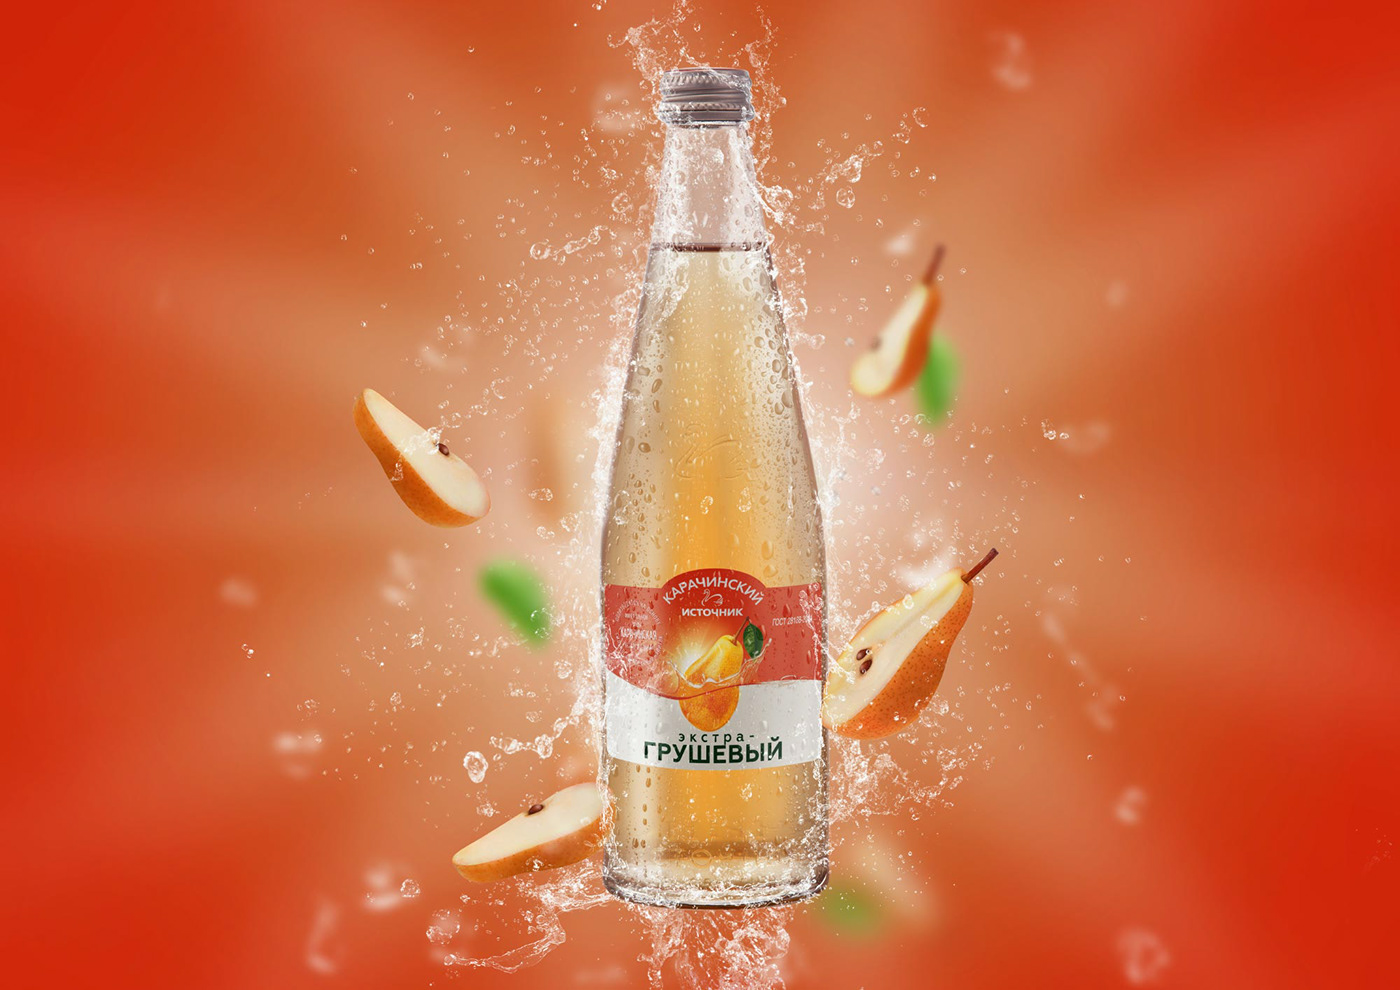 Keyvisual lemonade retouch soda water